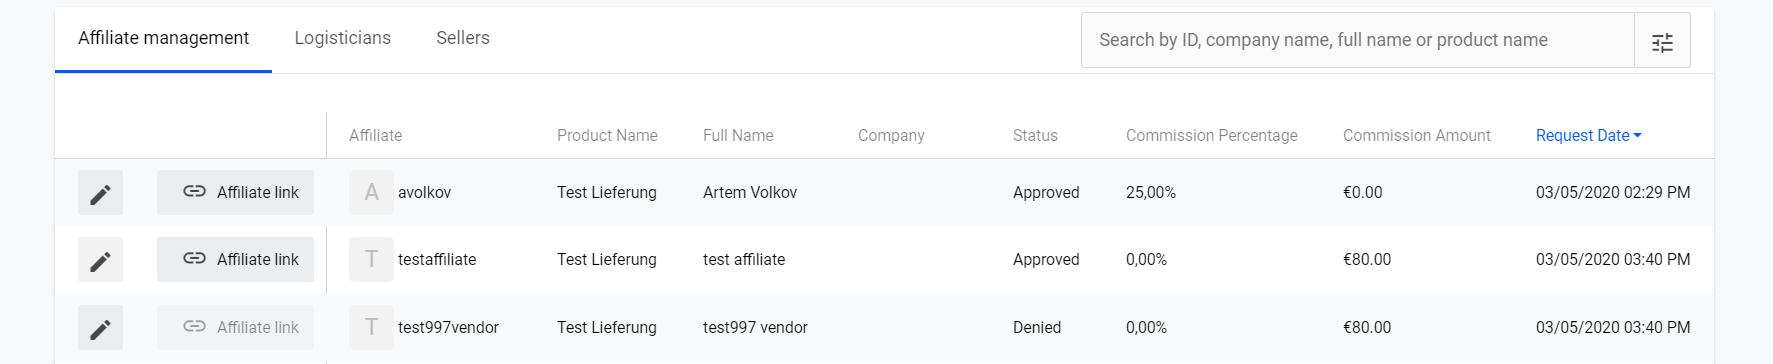 List of affiliates: Vendor view